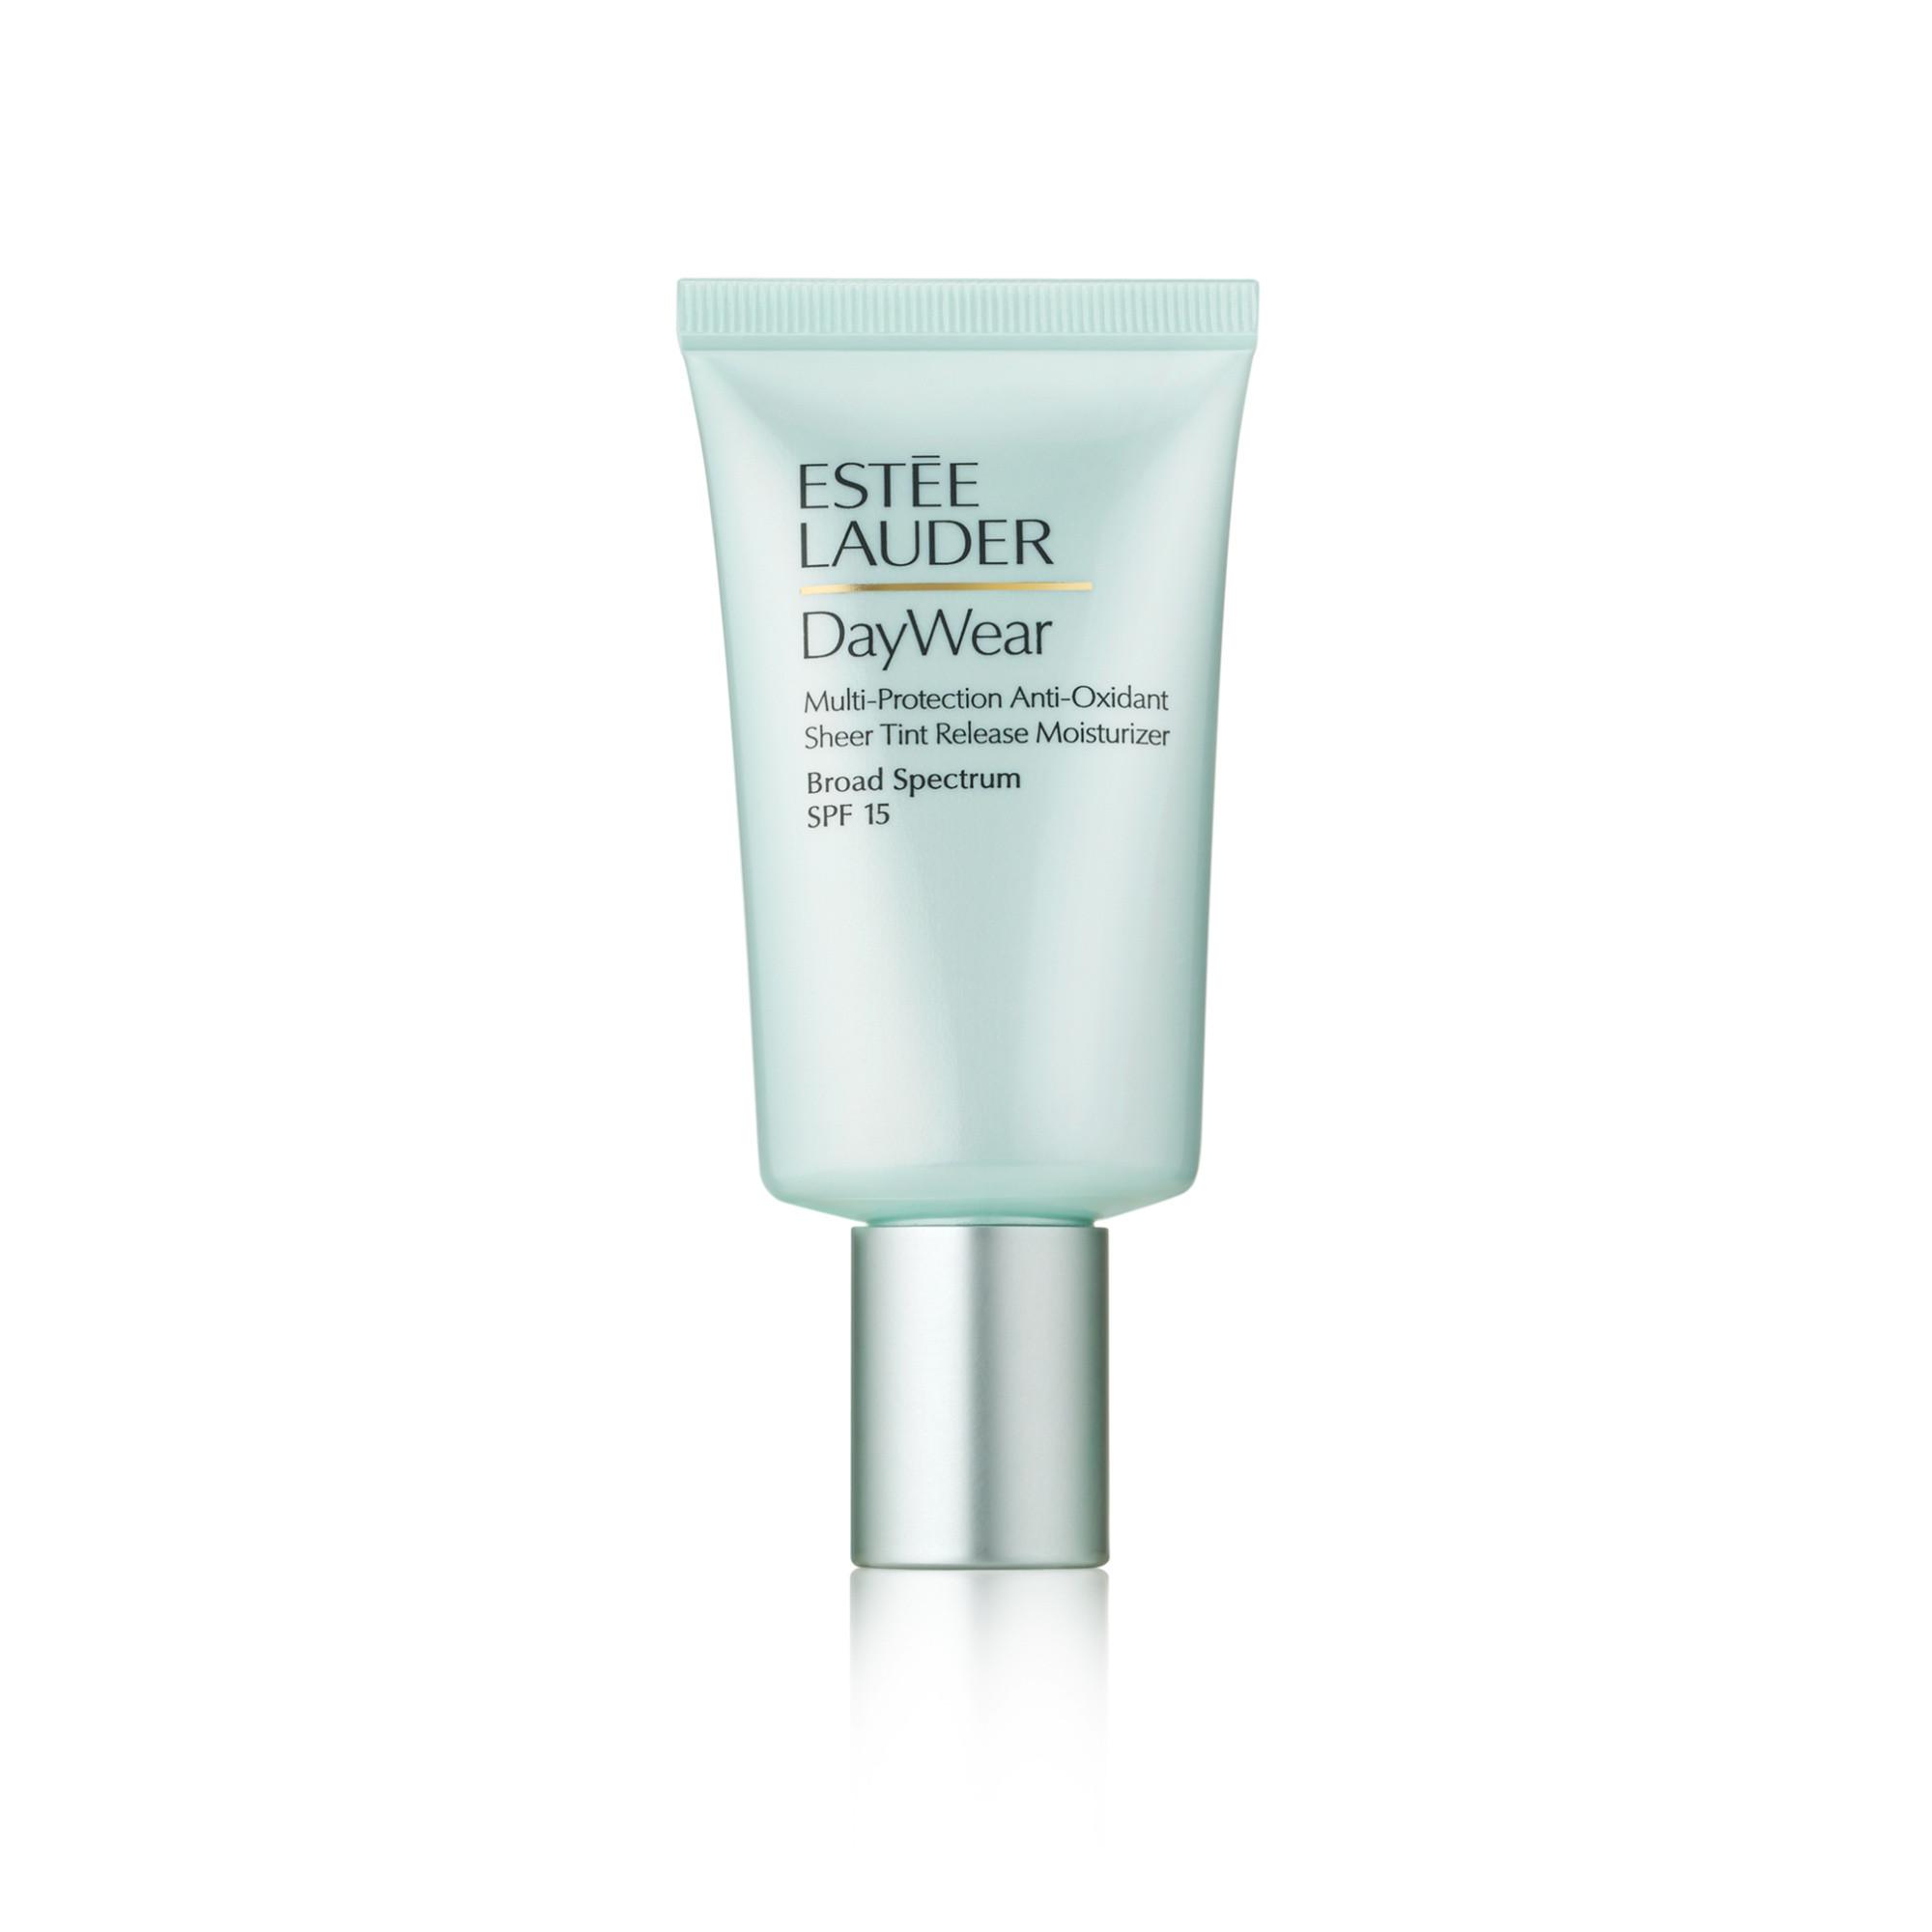 Estée Lauder softening lotion - 250 ml, Azzurro, large image number 0